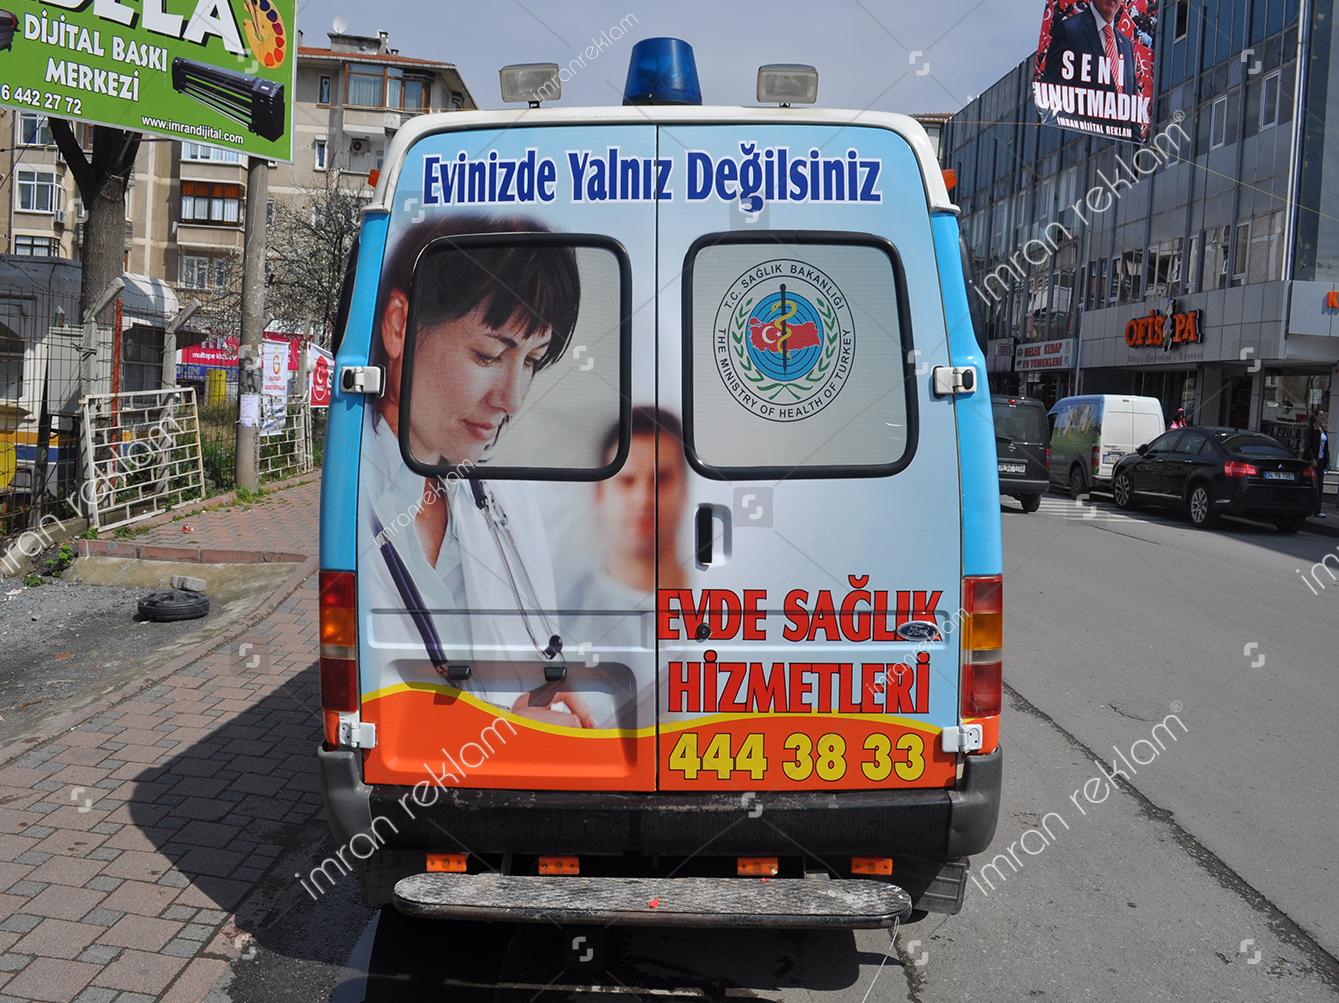 ambulans-giydirme-renk-degisimi-kaplama